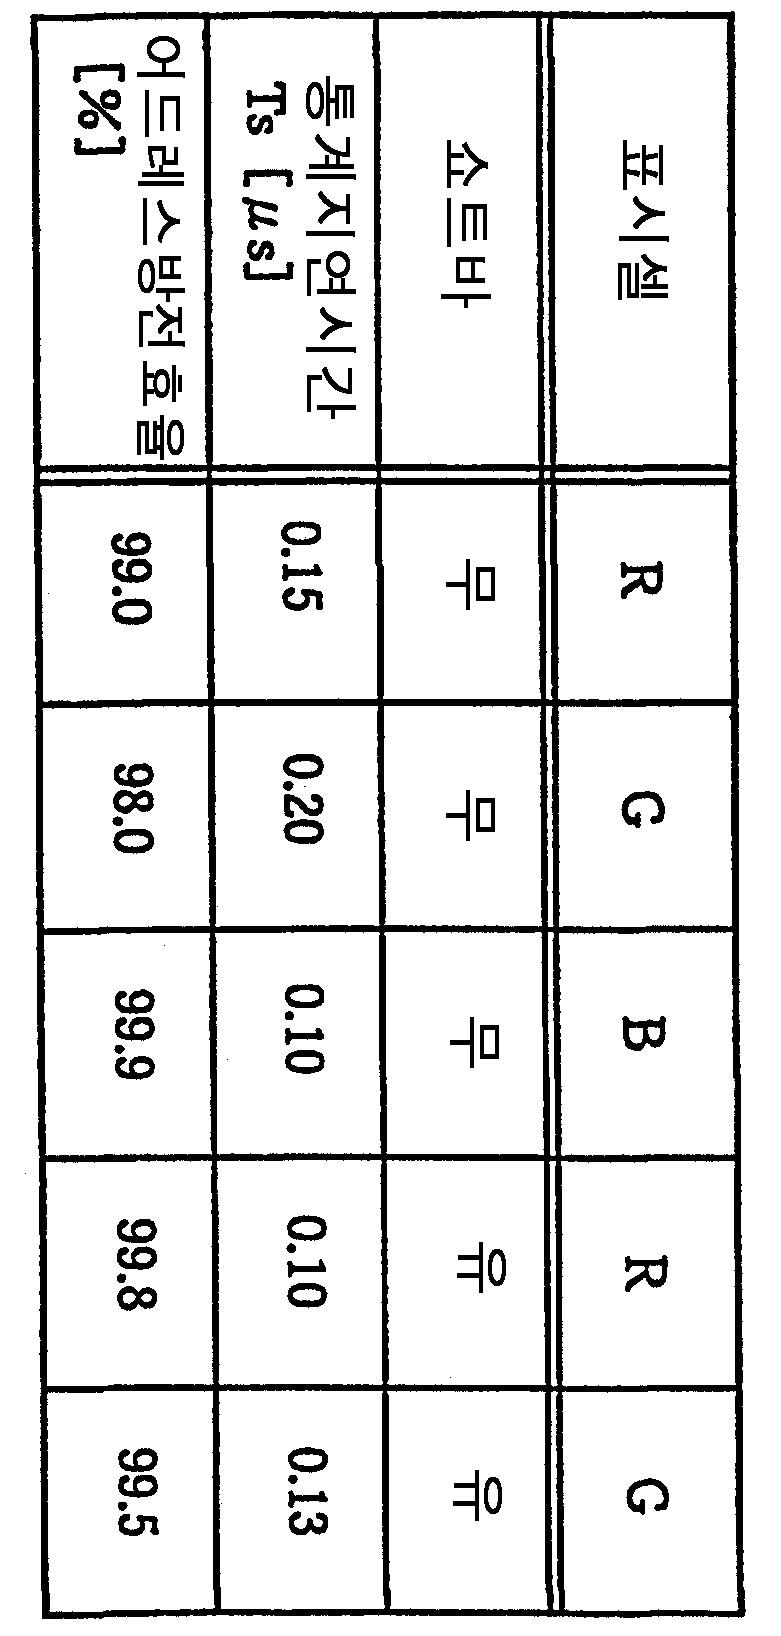 Figure 112008020582144-pat00162